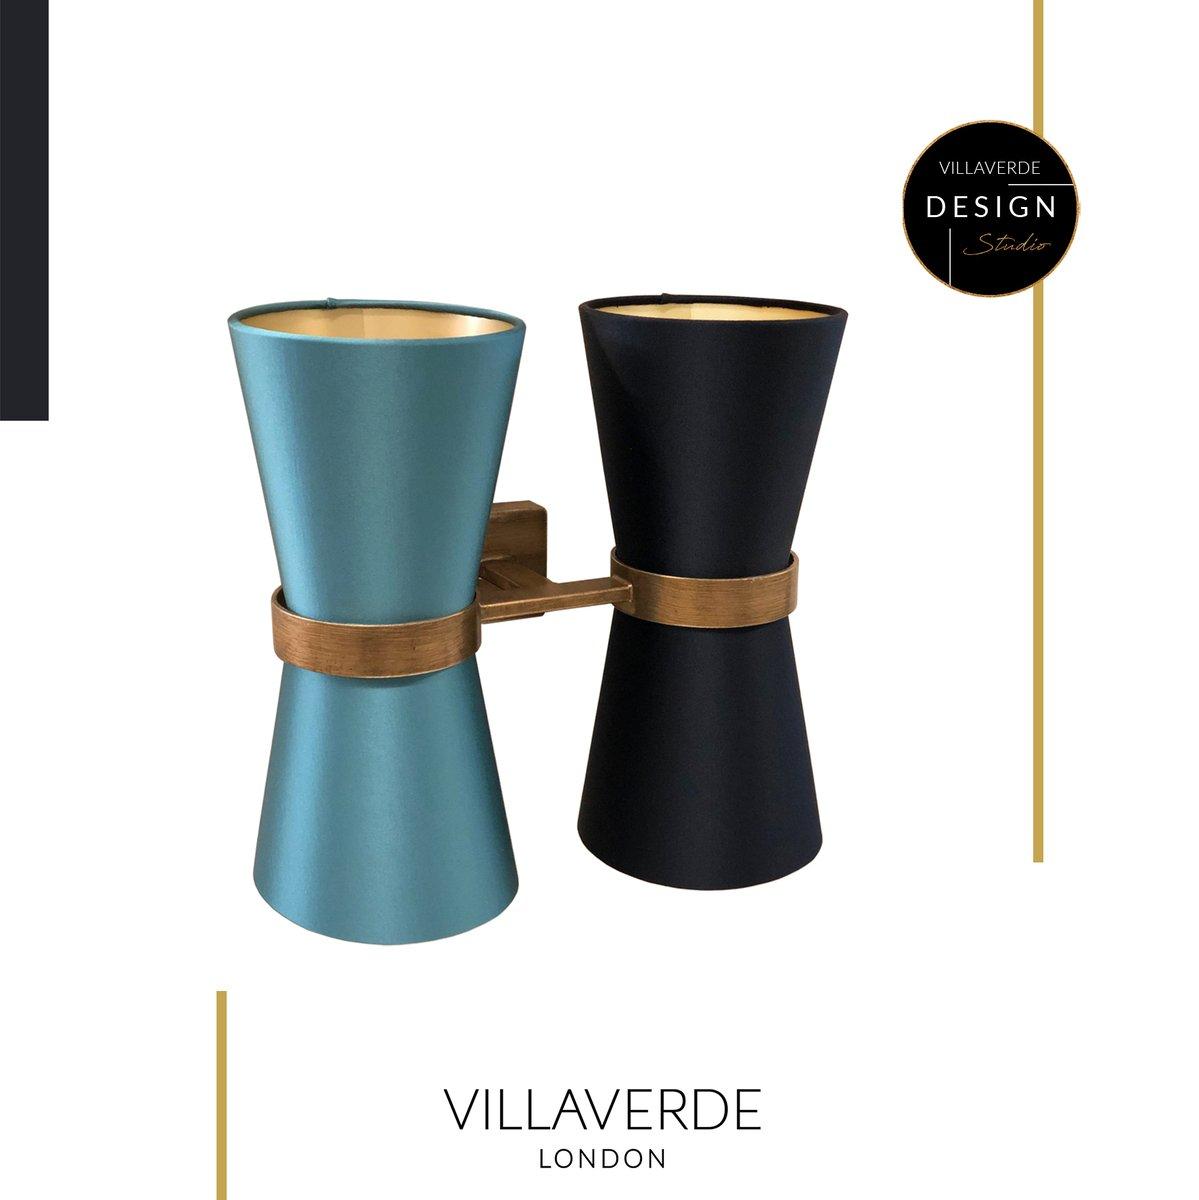 DESIGN STUDIO at VILLAVERDE - Let us design for you!  KONO WALL LIGHT designed by@claudiomarcoukfor interior worldwide!  WINTER SALE NOW ON - 20% OFF ALL NEW ORDERS   #Winter #Cold #Kono #Blue #Gold #Sale #Bespoke #Designstudio #Lighting#MadeinItaly#Handmade#Instalight